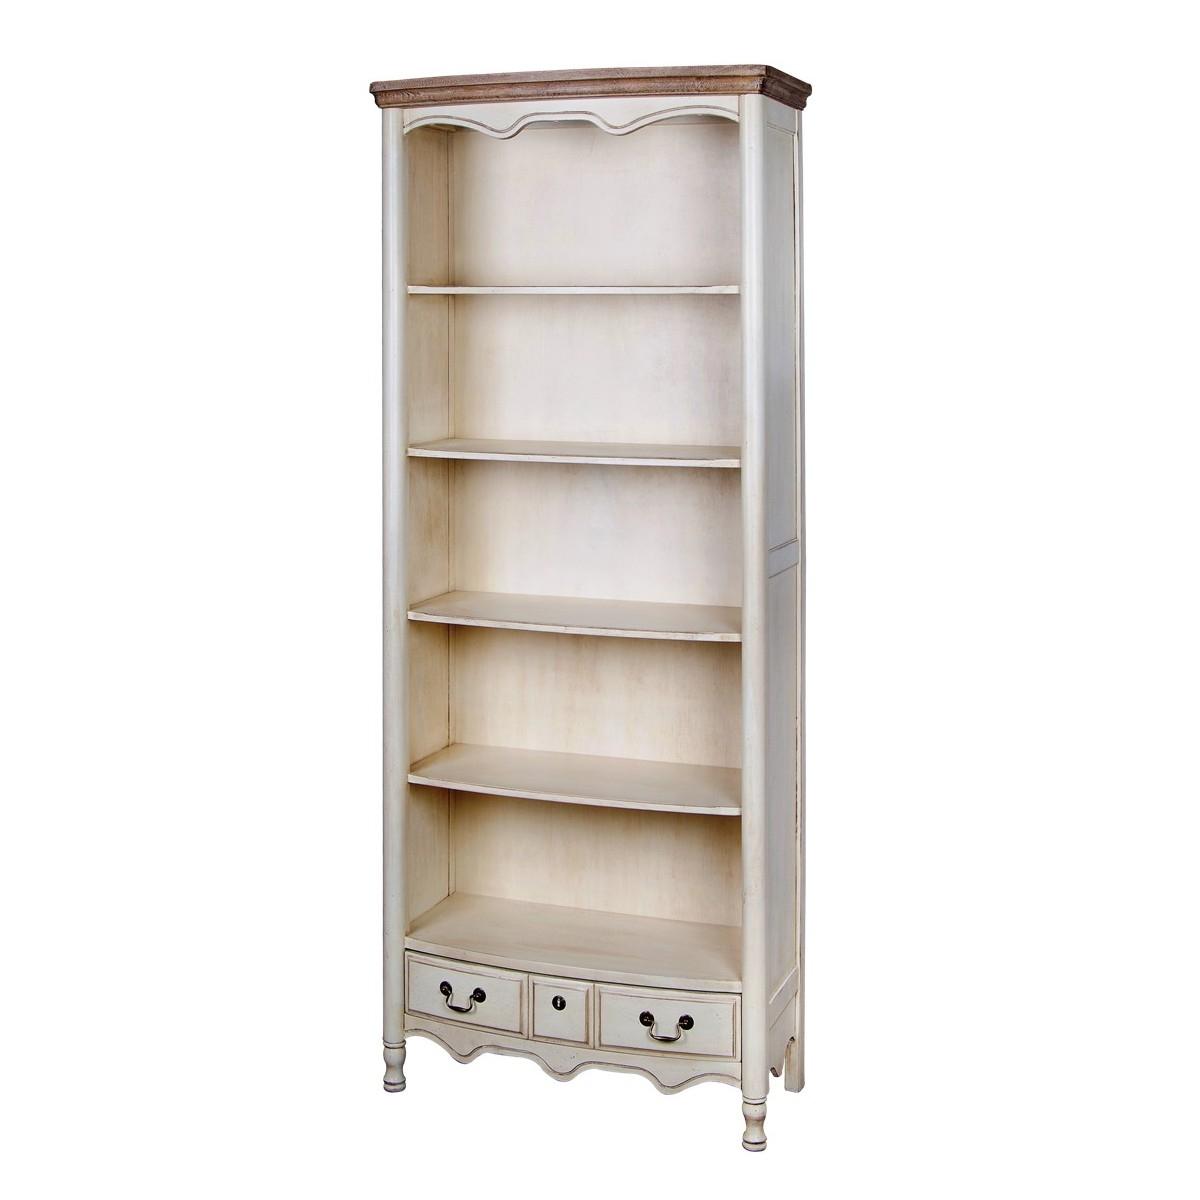 Biblioteca din lemn de cauciuc si furnir, cu 1 sertar Limena LI819 Ivory, l80xA39xH192 cm somproduct.ro